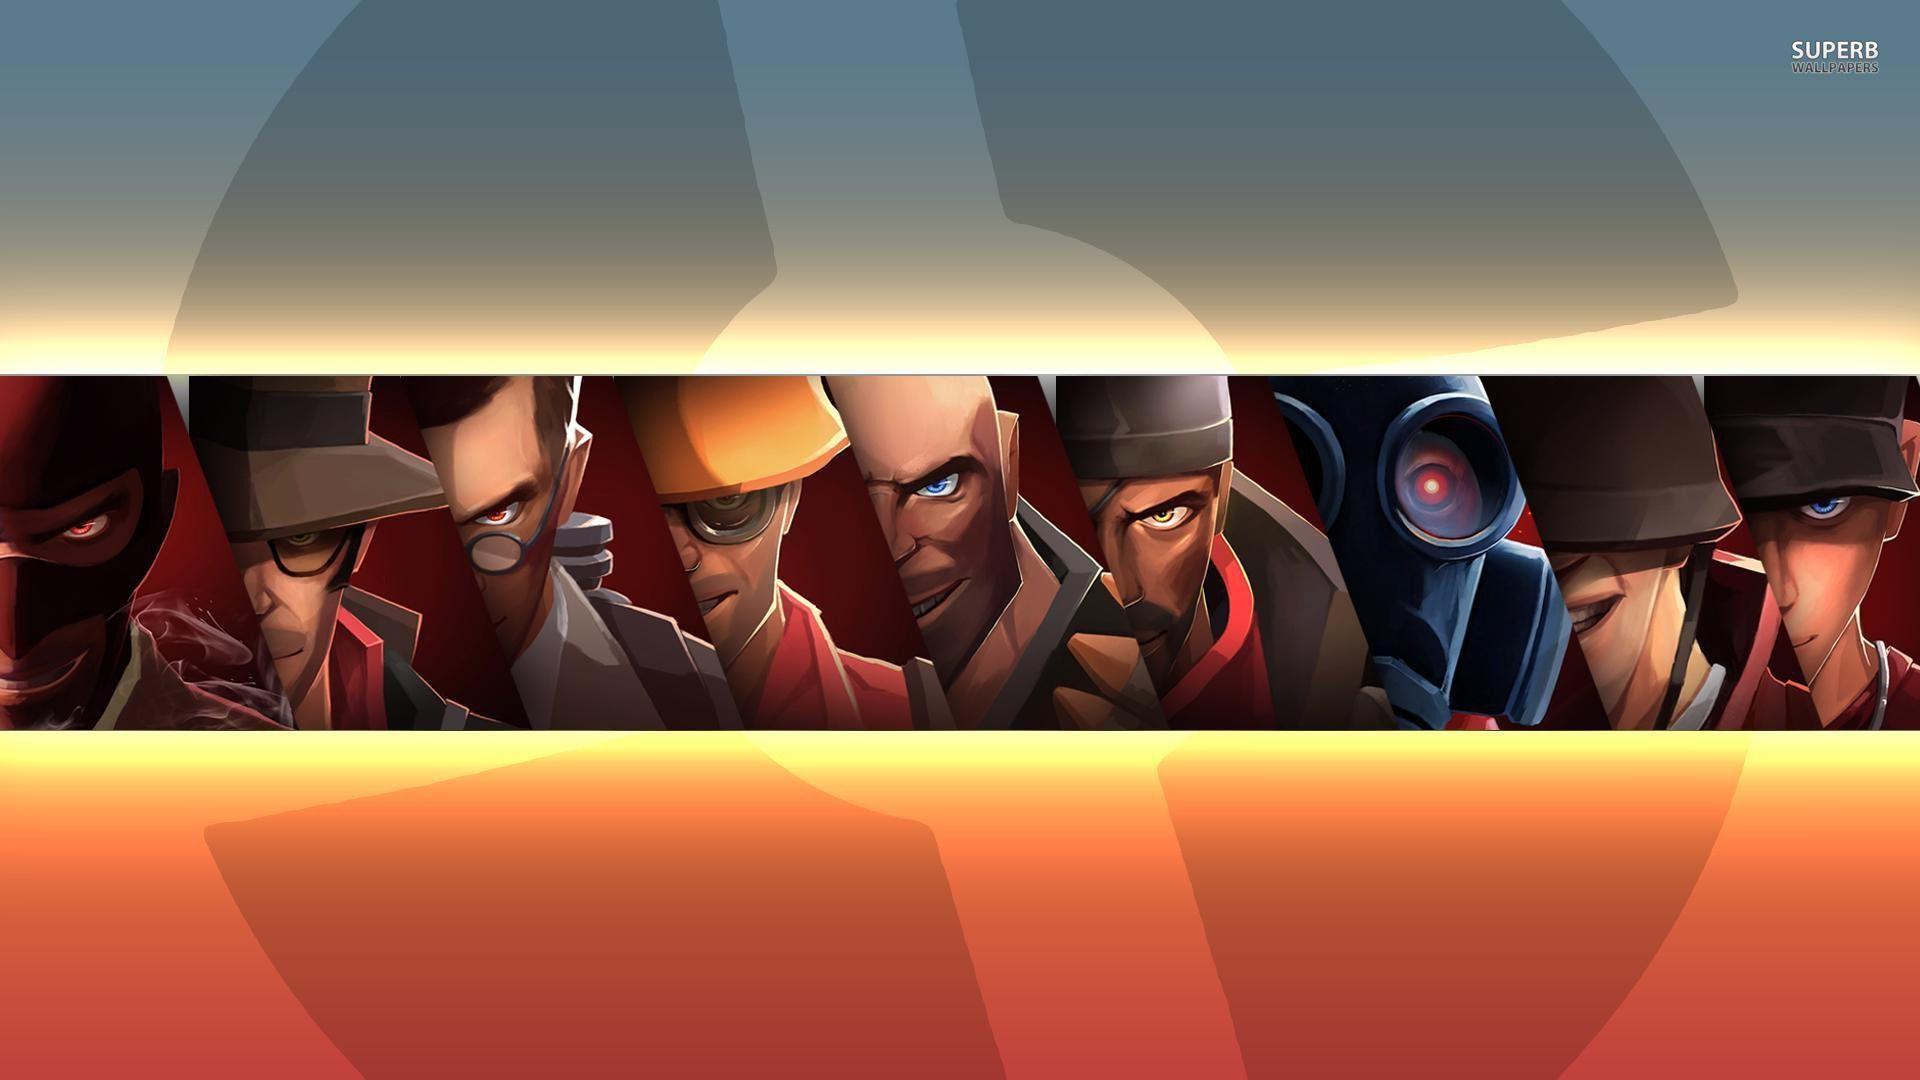 Team Fortress Wallpaper Wallpapertag